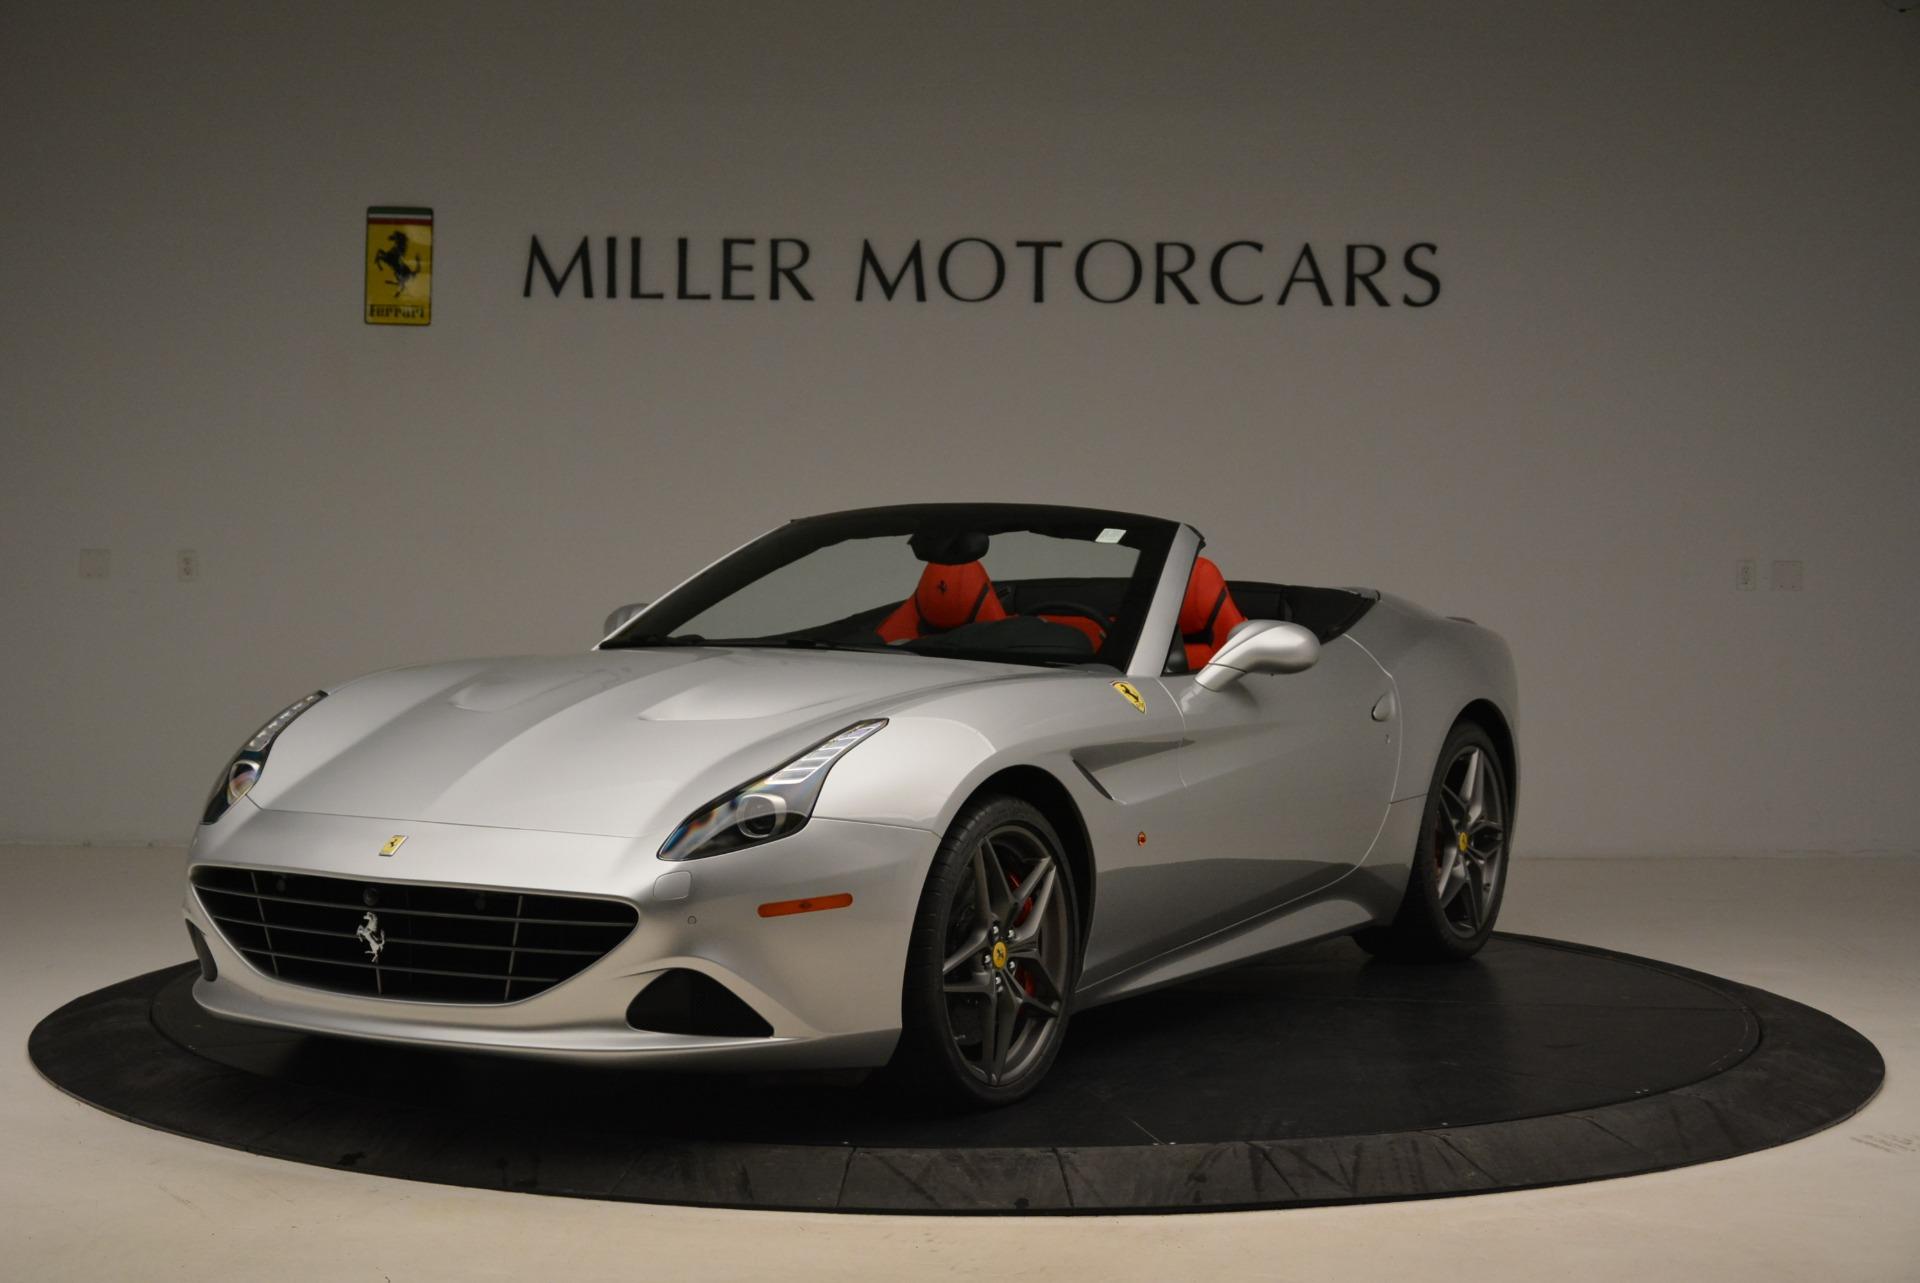 Used 2017 Ferrari California T Handling Speciale for sale Sold at Alfa Romeo of Westport in Westport CT 06880 1